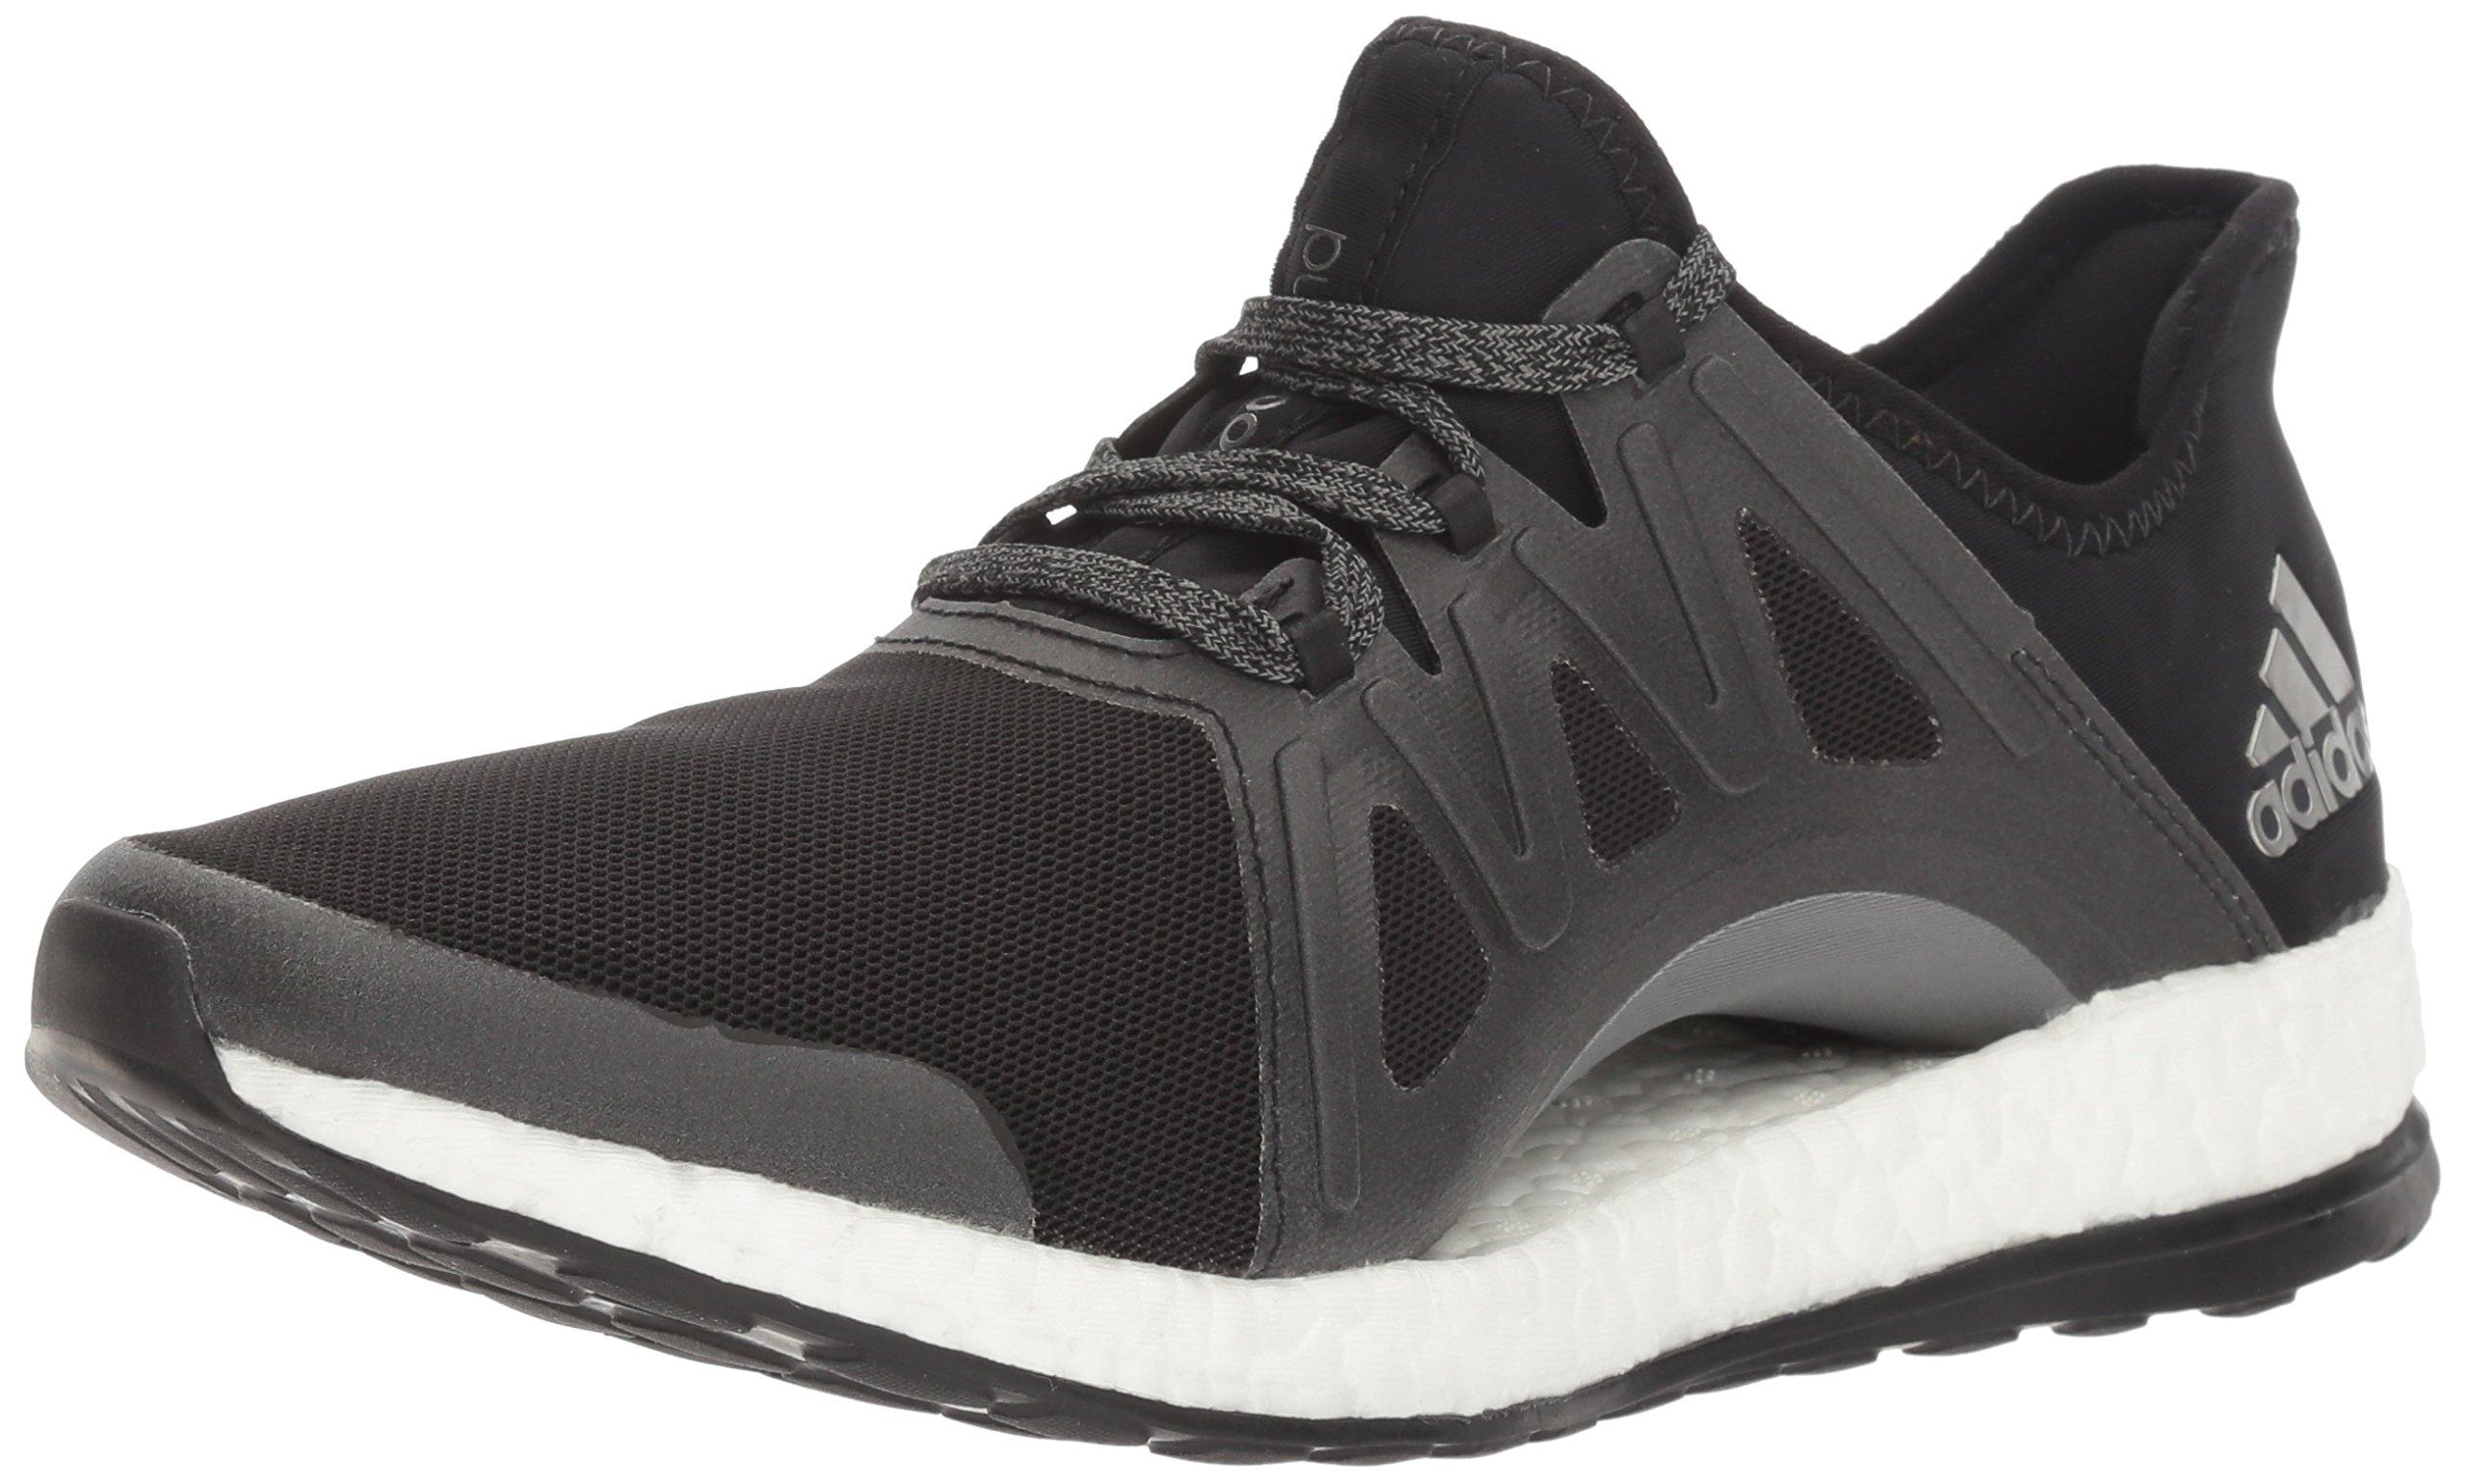 cec06e393 Galleon - Adidas Women s Pureboost Xpose Running Shoe